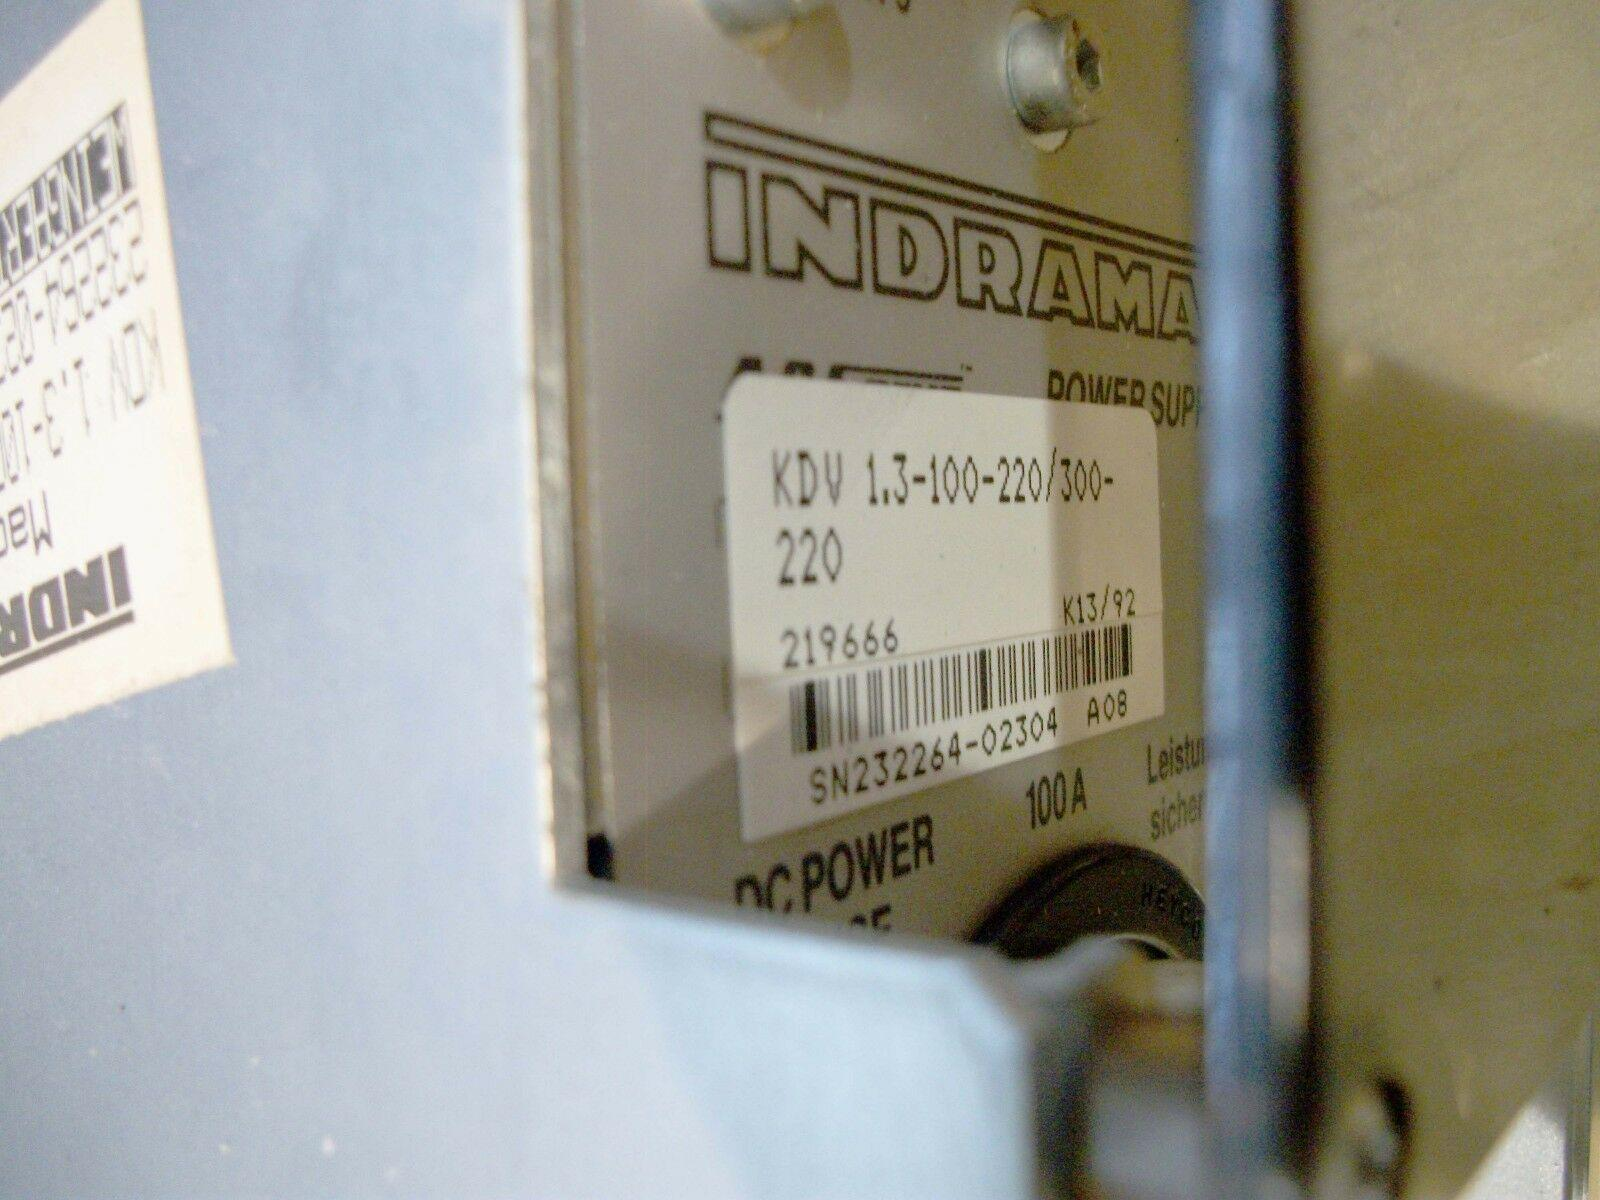 Indramat Power Supply Model KOV 1.3-100-220/300-220